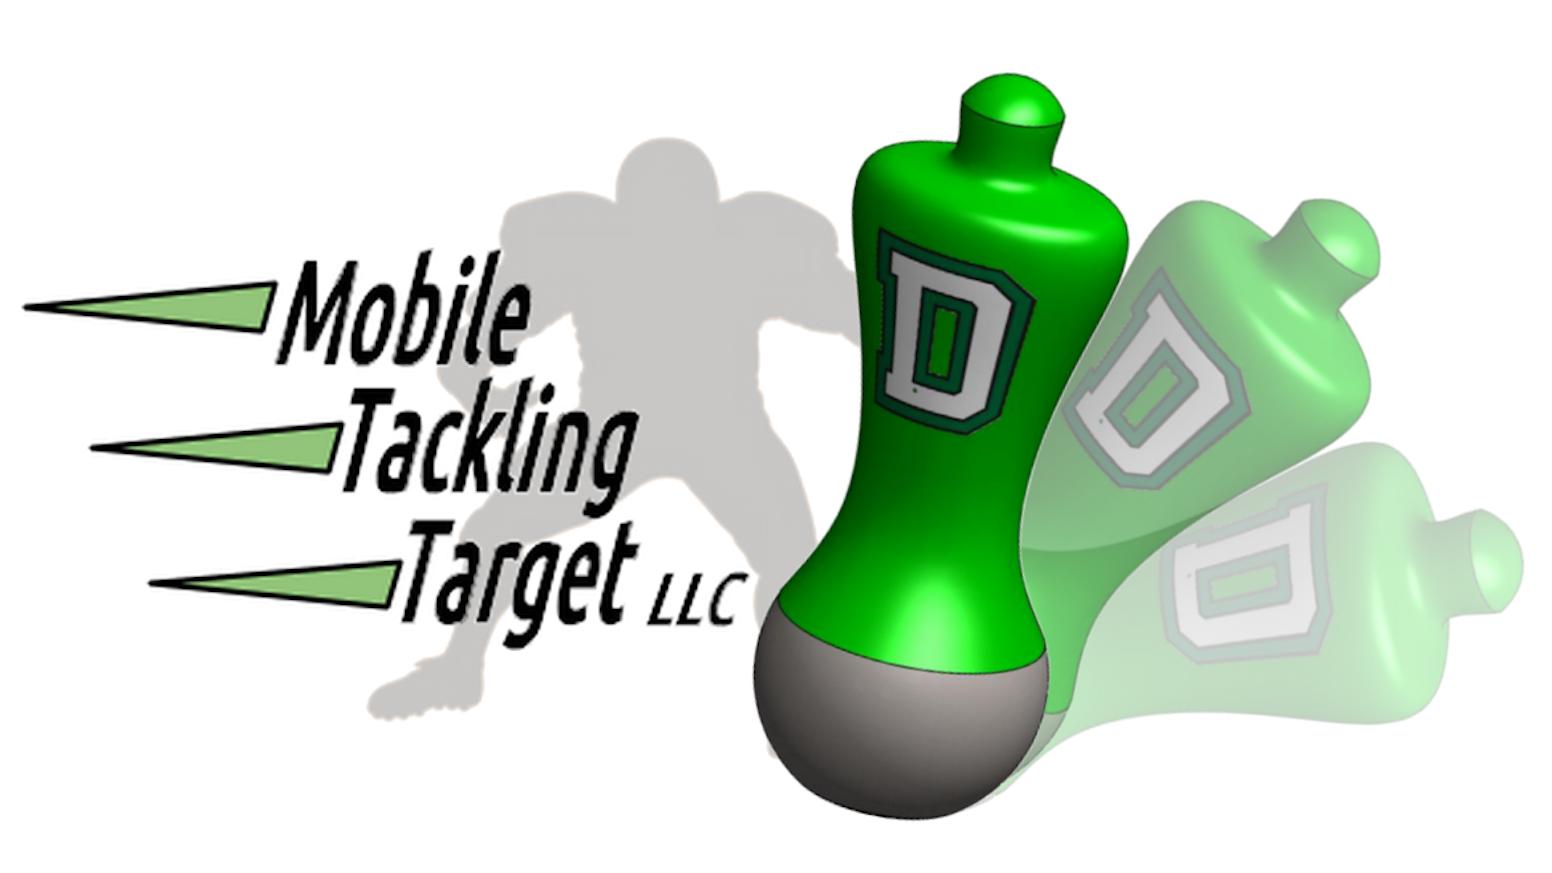 Mobile Tackling Target: A Better Way to Train by Elliot Kastner ...